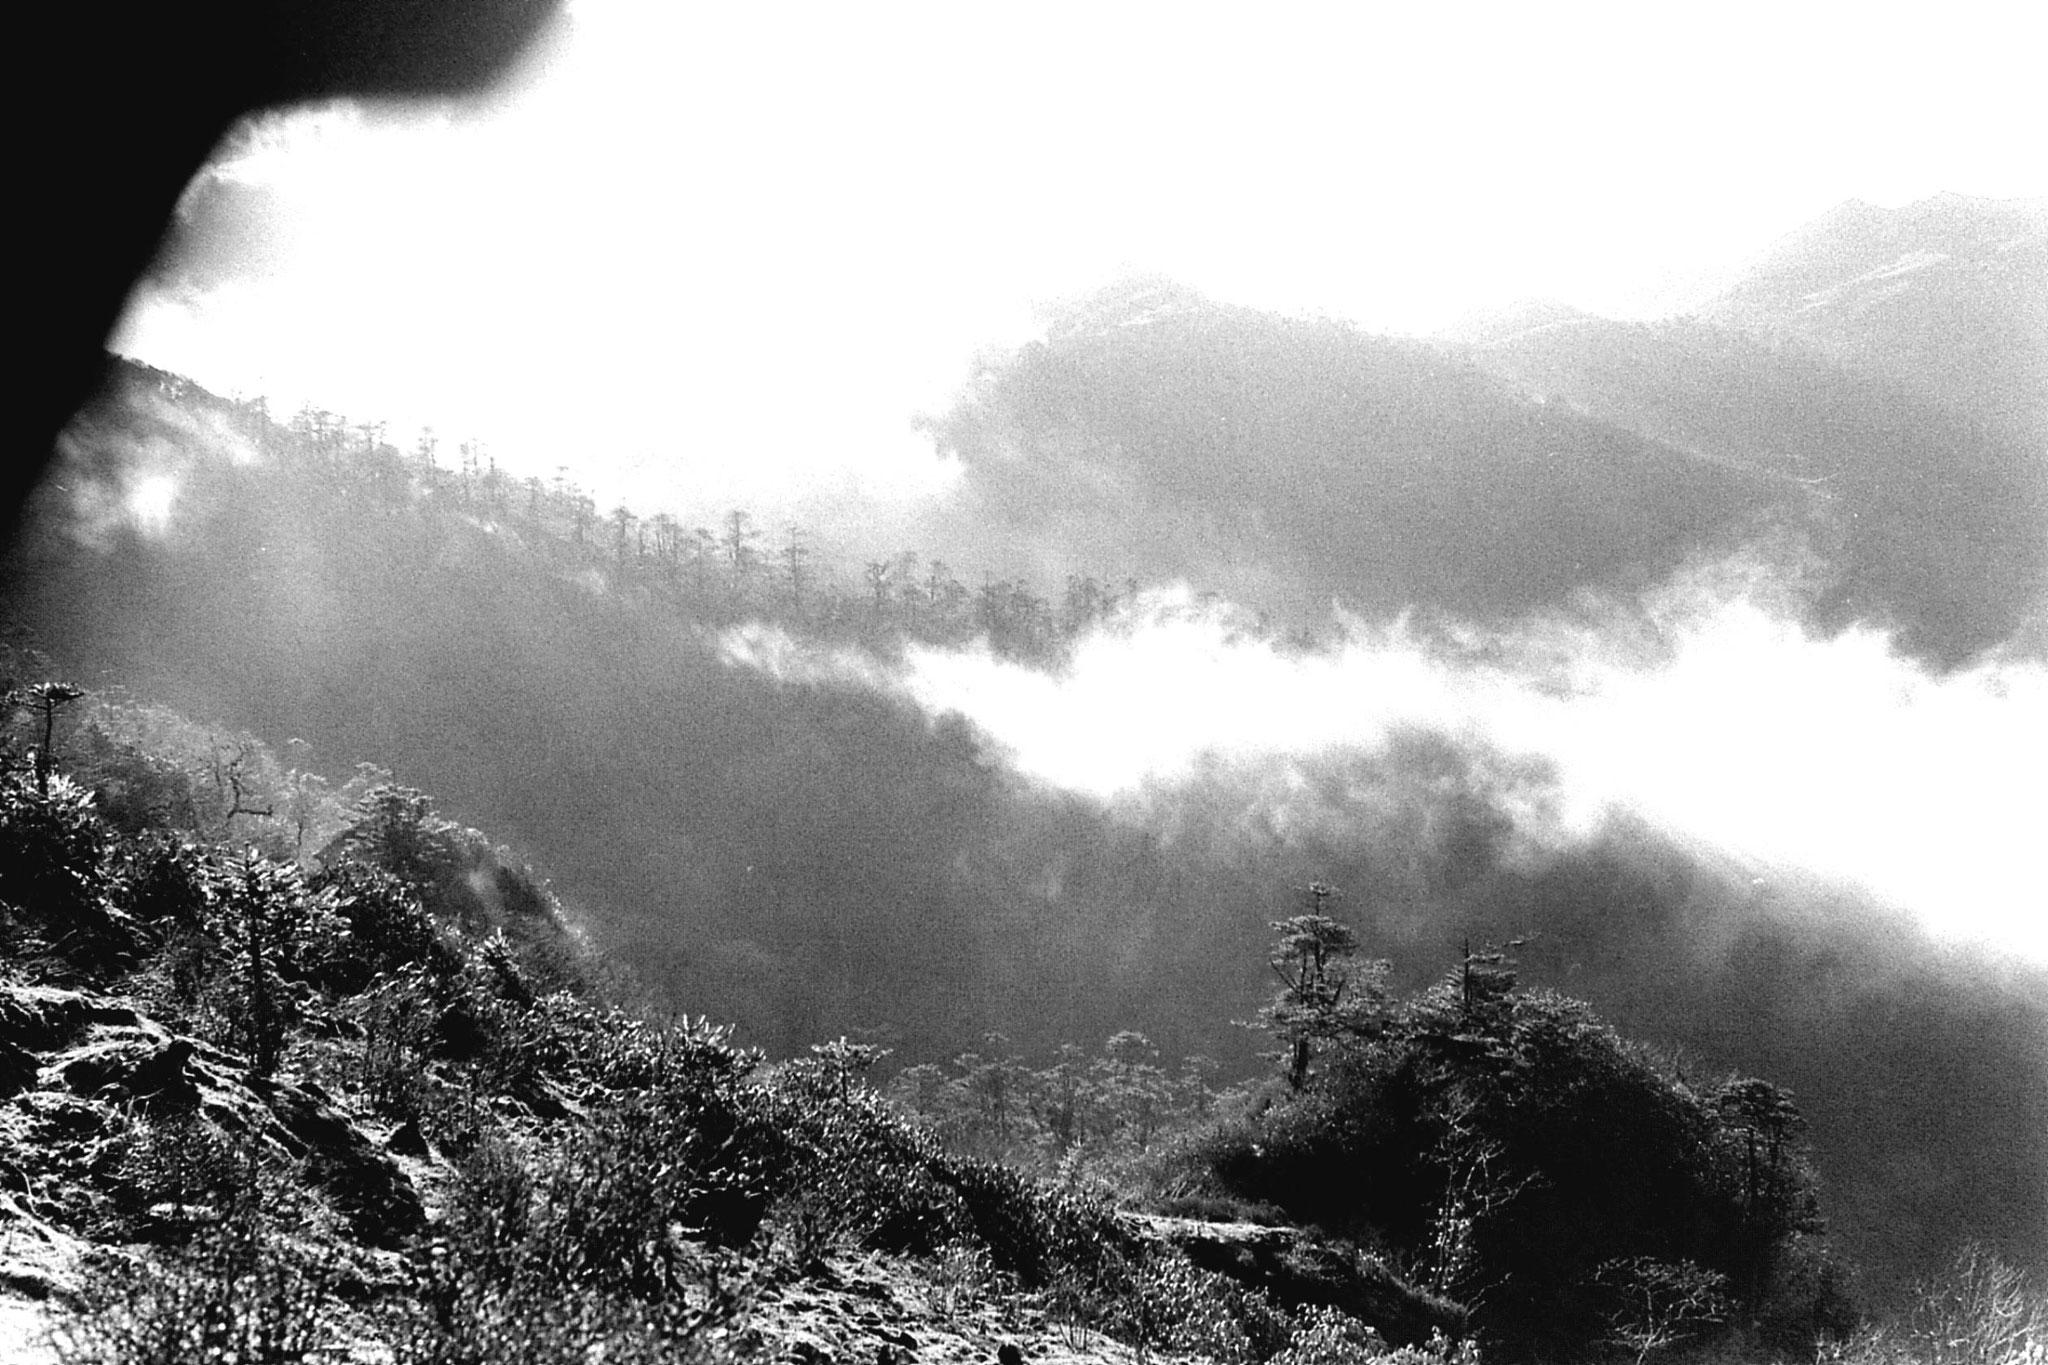 6/5/1990: 14: Sandakpu NW, near hills